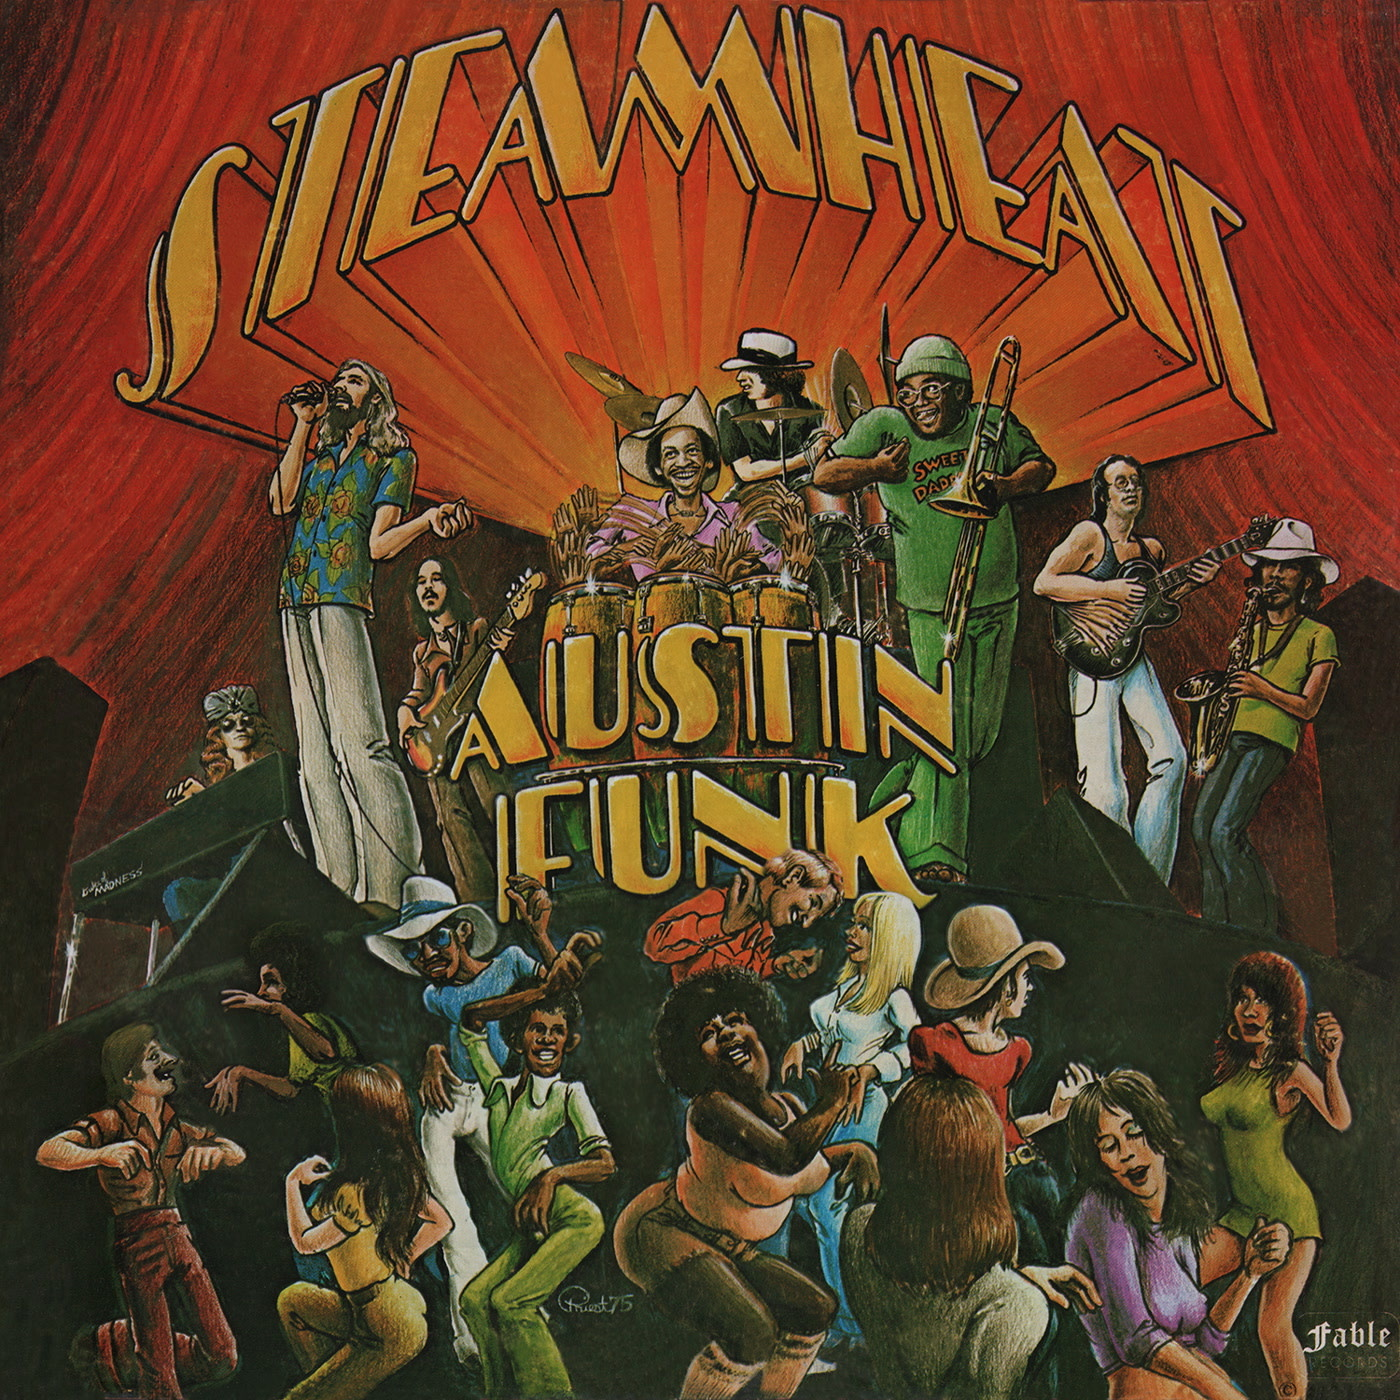 Jazzman Steamheat - Austin Funk